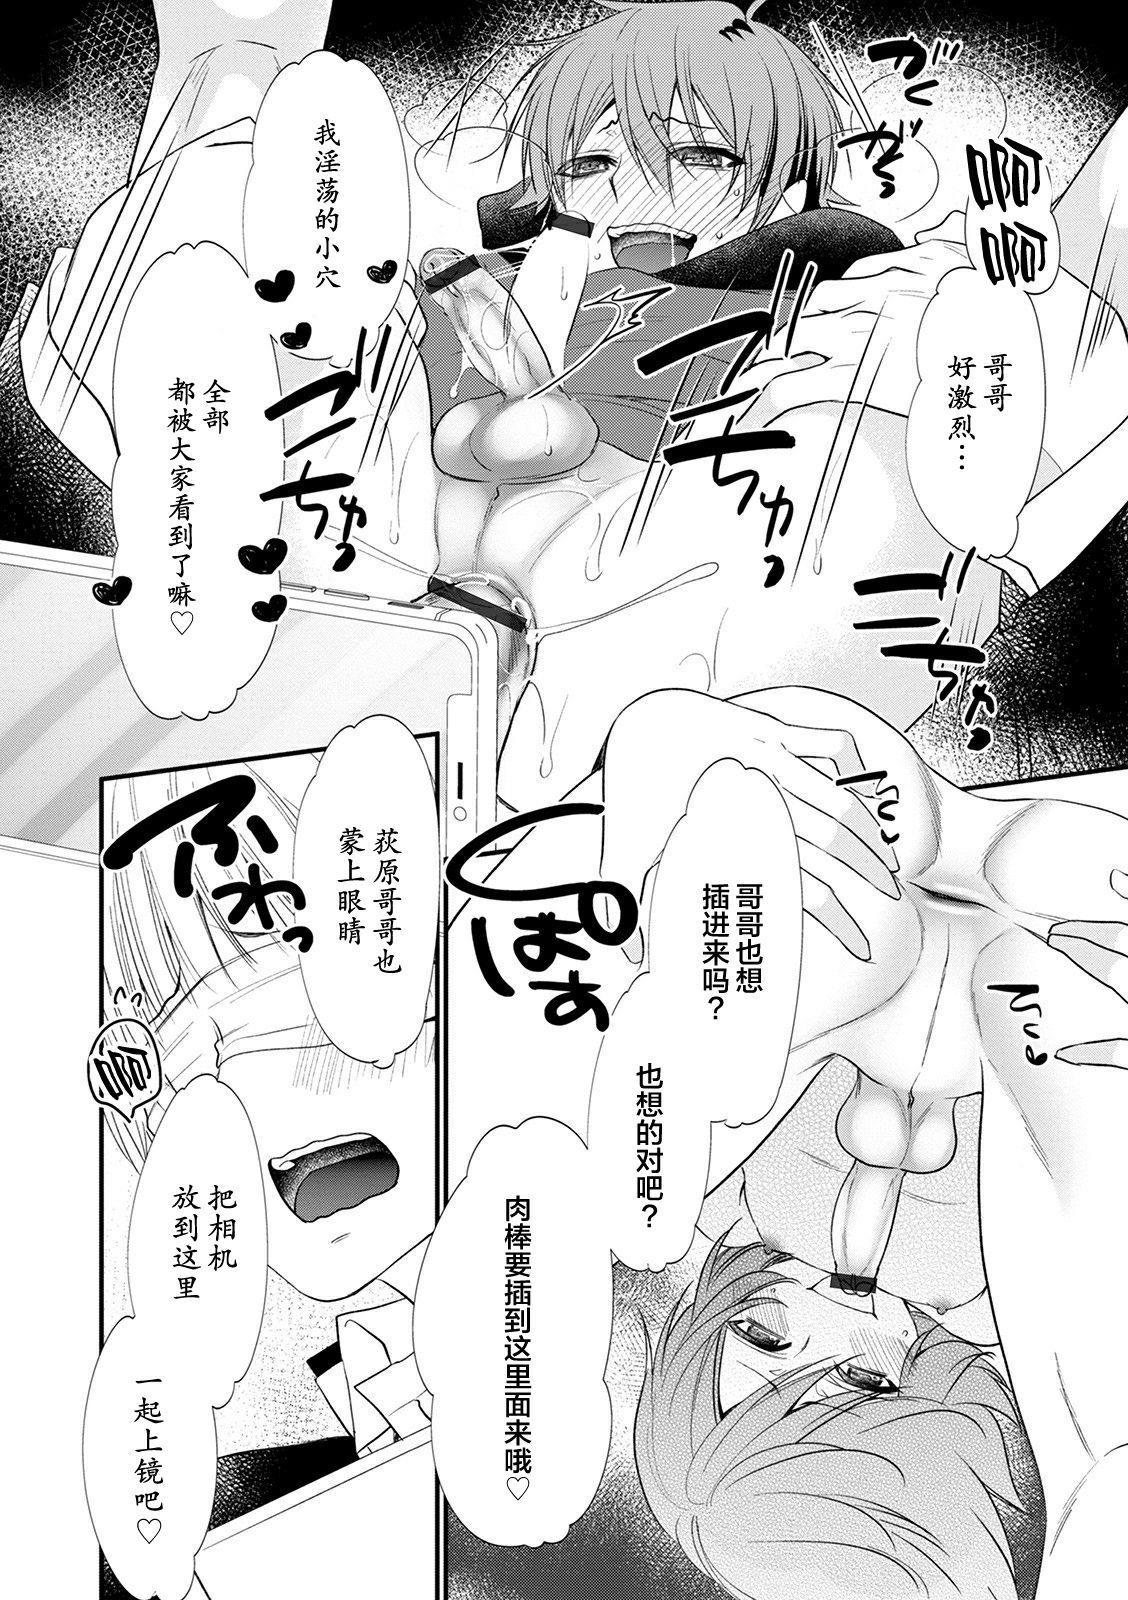 [Naokichi.] Otouto-tachi no Bouken - Indecent brothers adventure Ch. 1-3 [Chinese] [逃亡者×新桥月白日语社] [Digital] 39